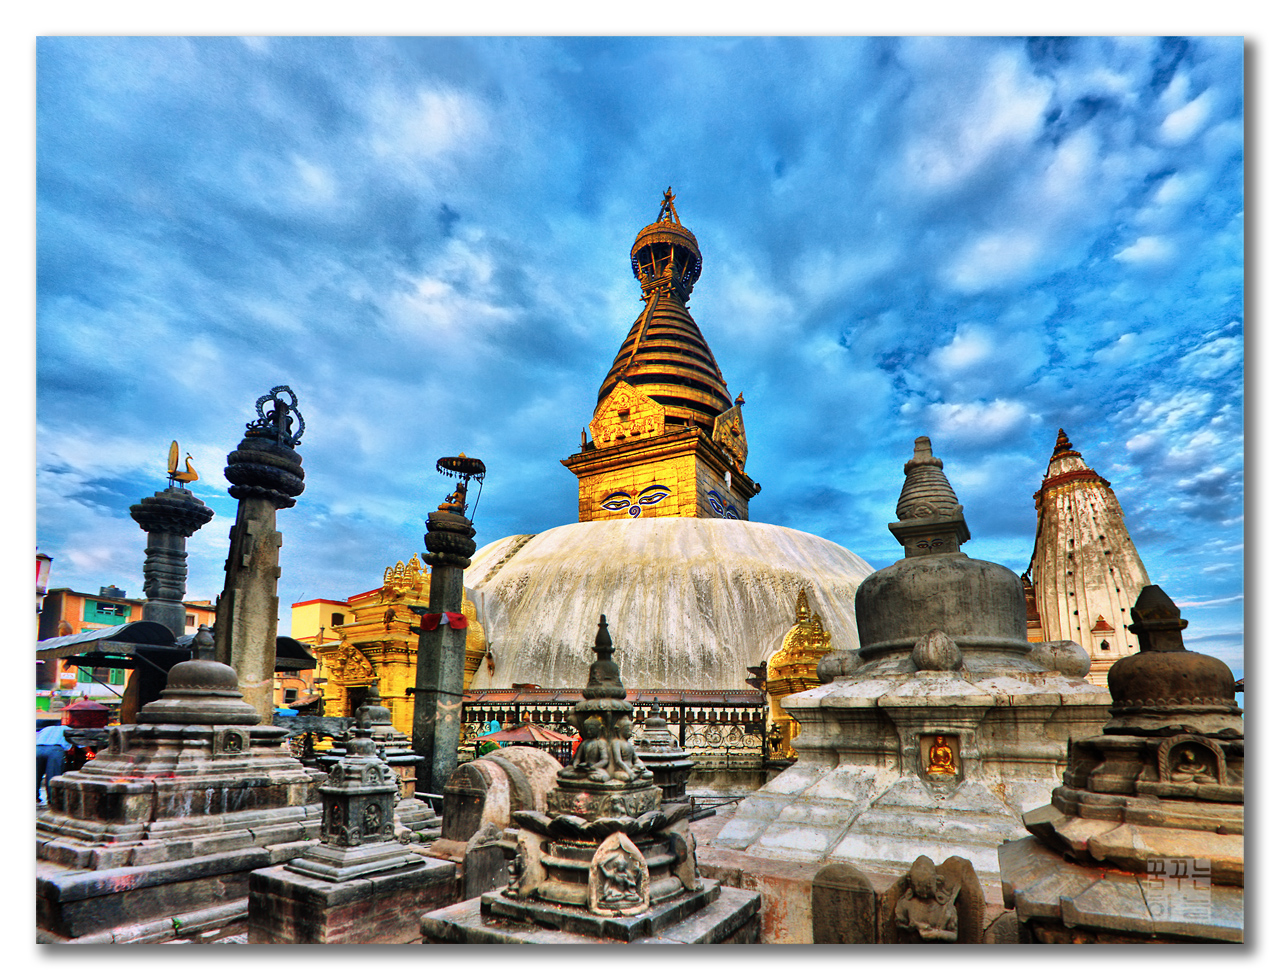 Swayambhunath in Kathmandu Valley